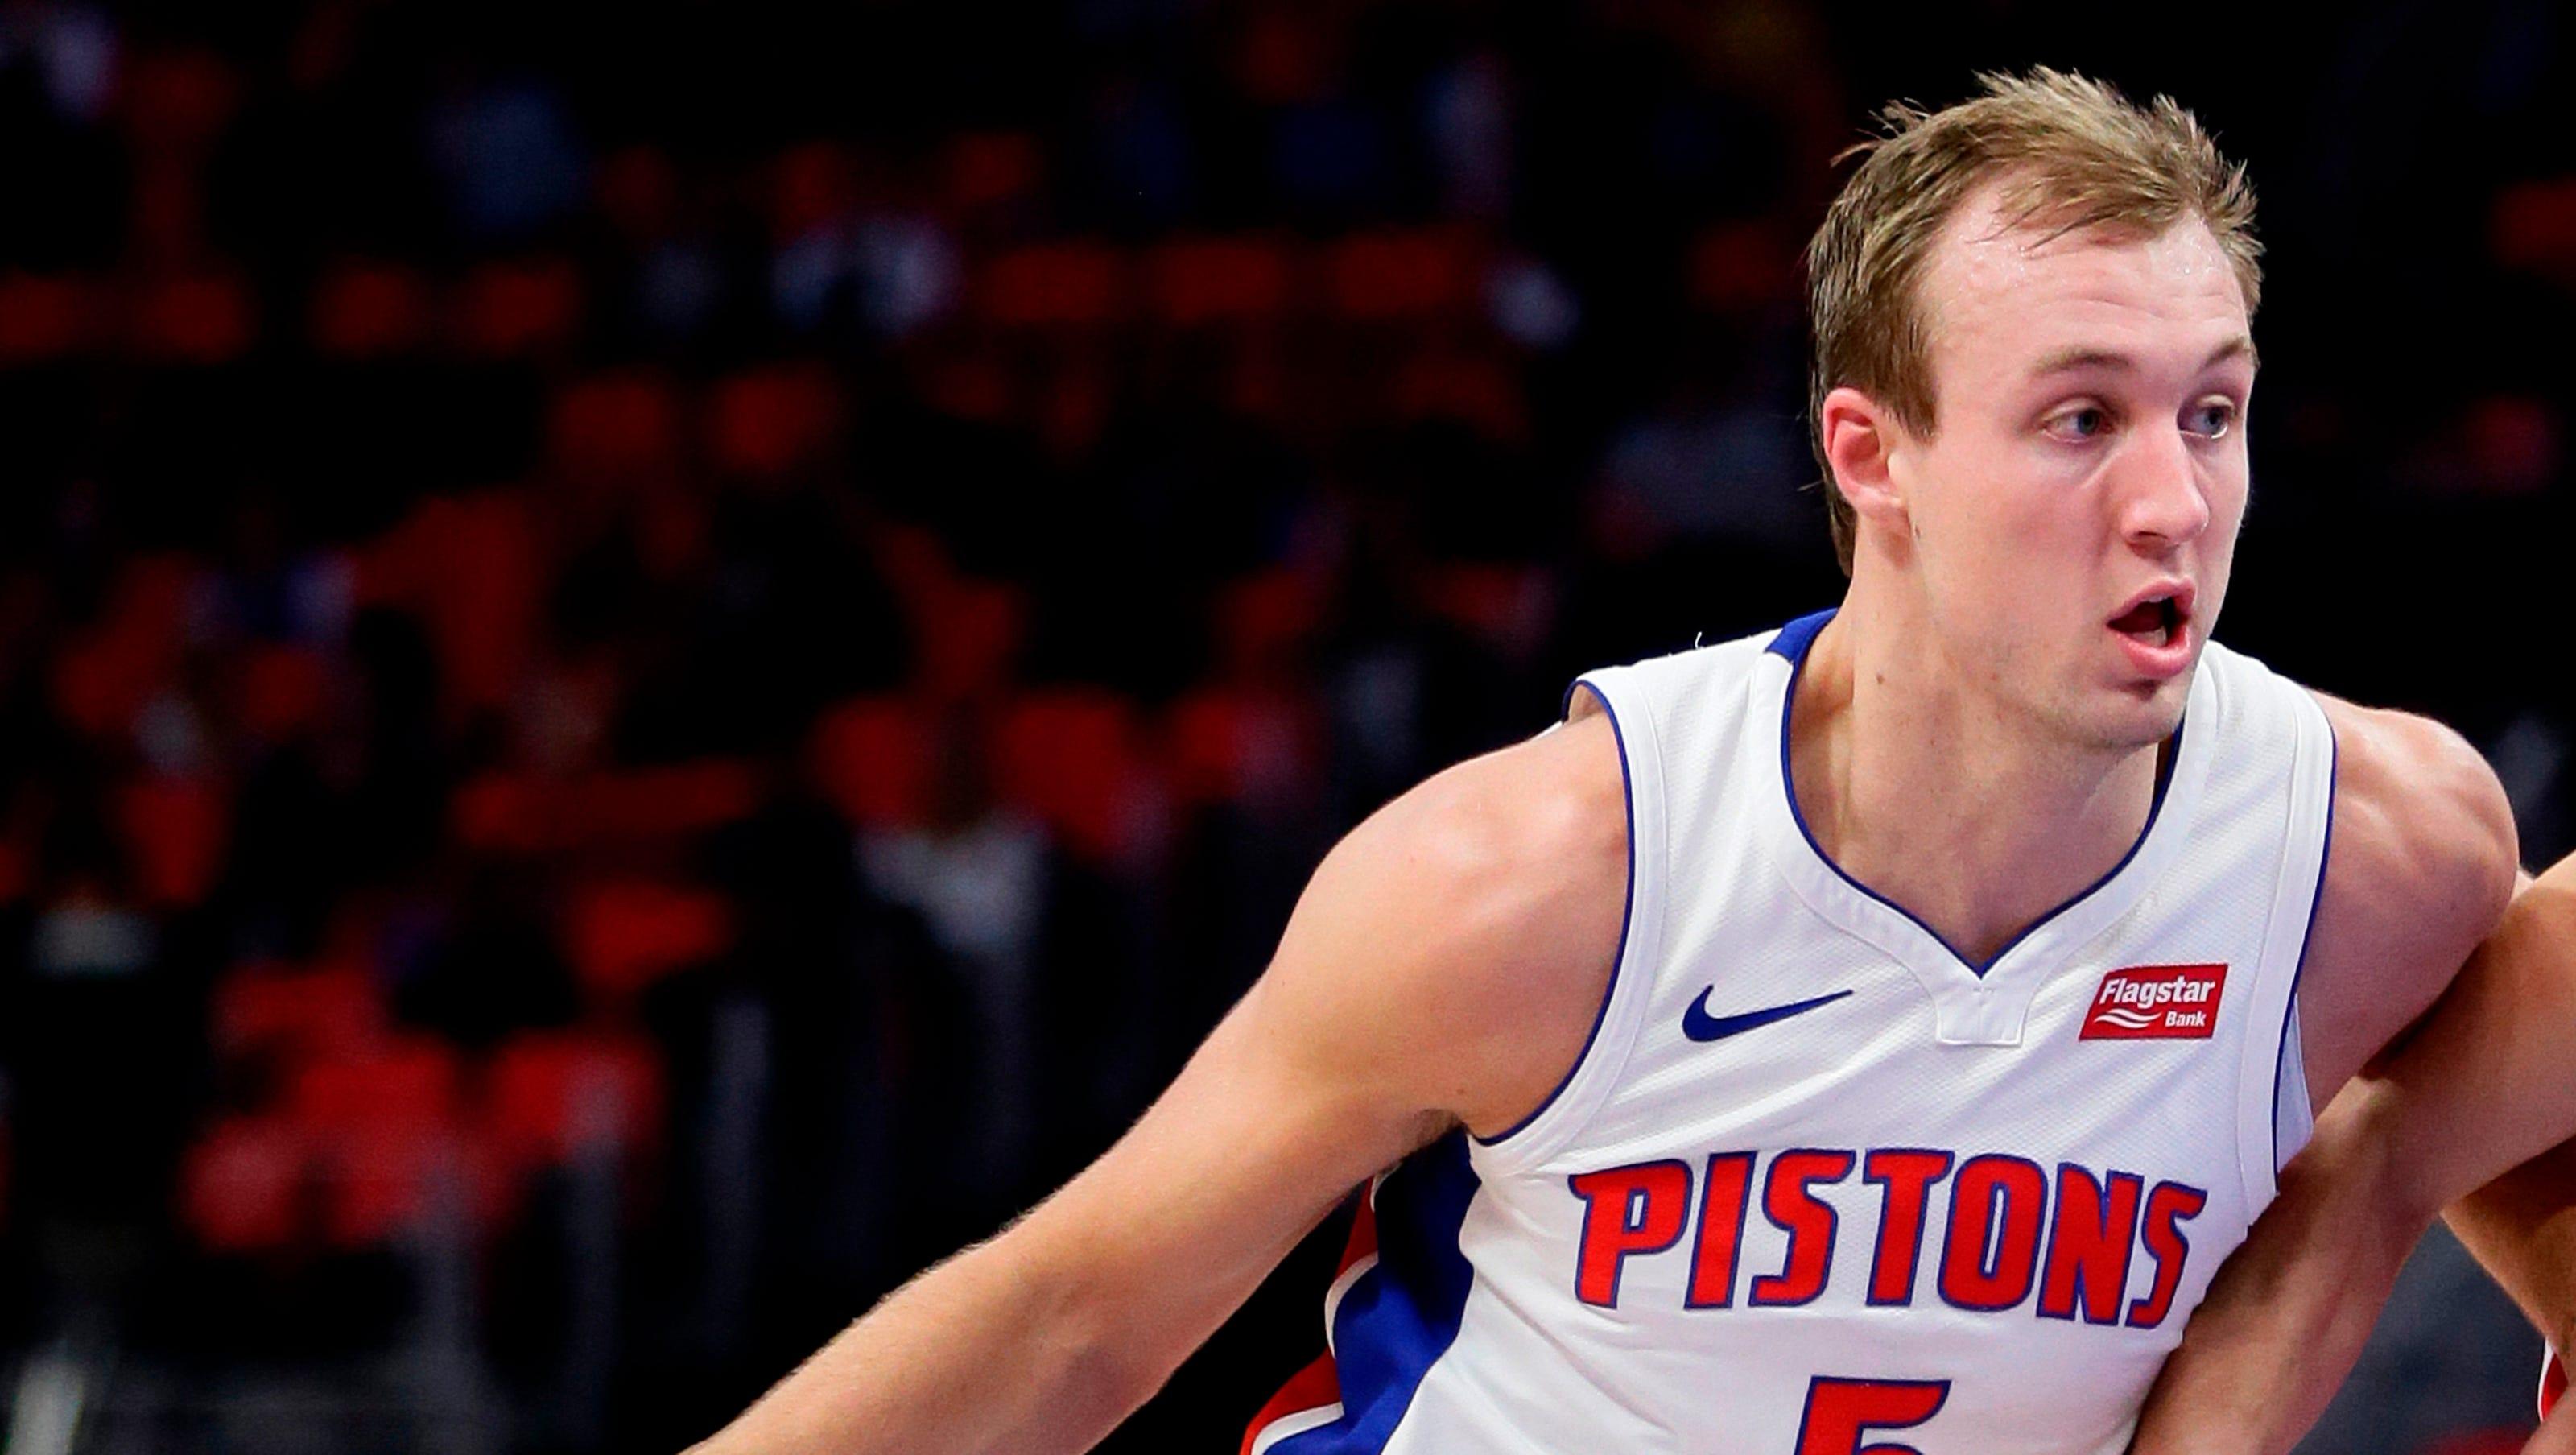 Pistons' Luke Kennard suffers shoulder injury